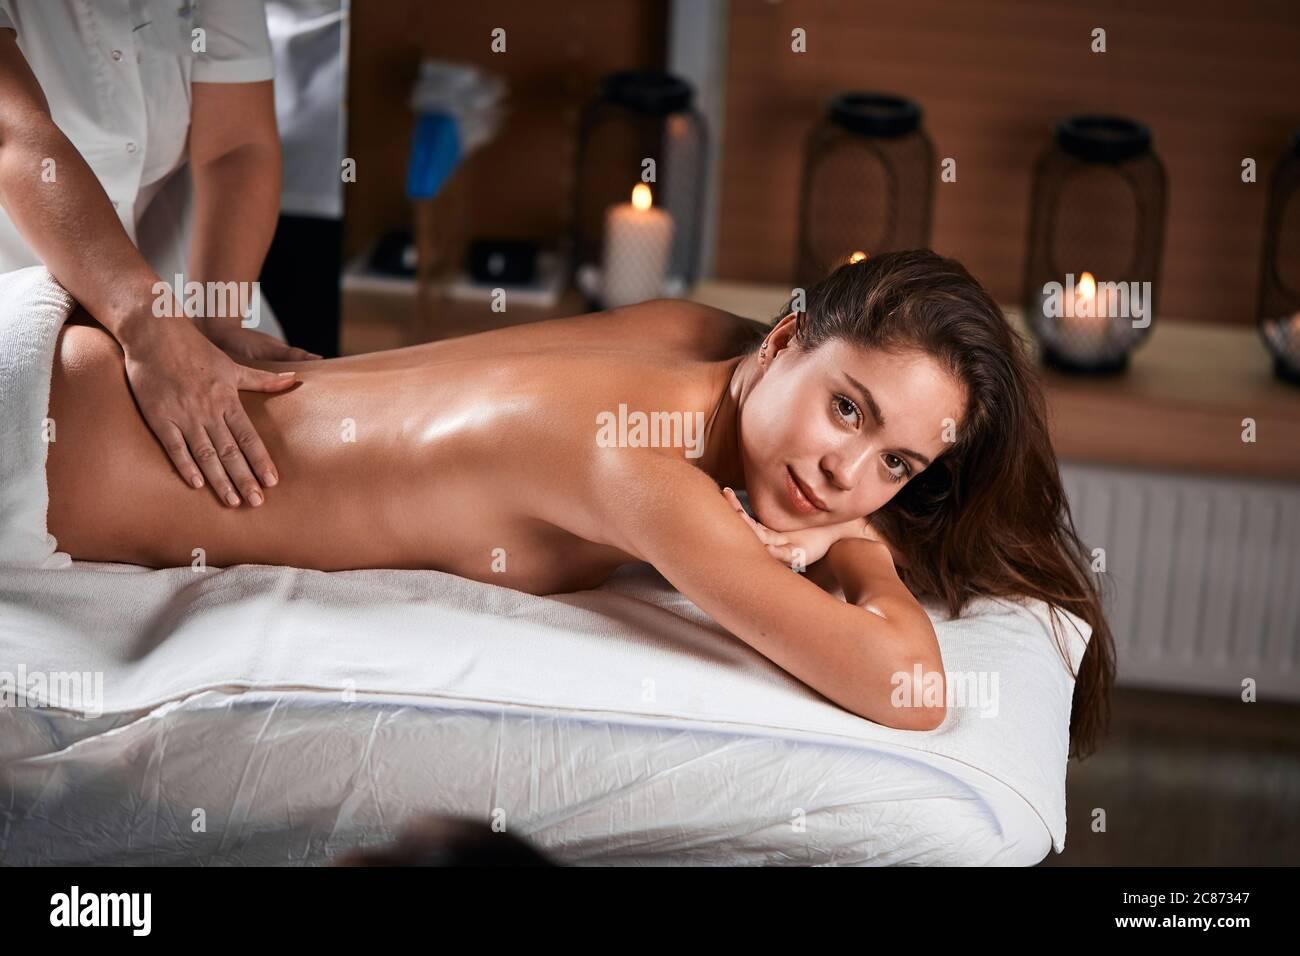 Munich massage in body body to Escort Angie,